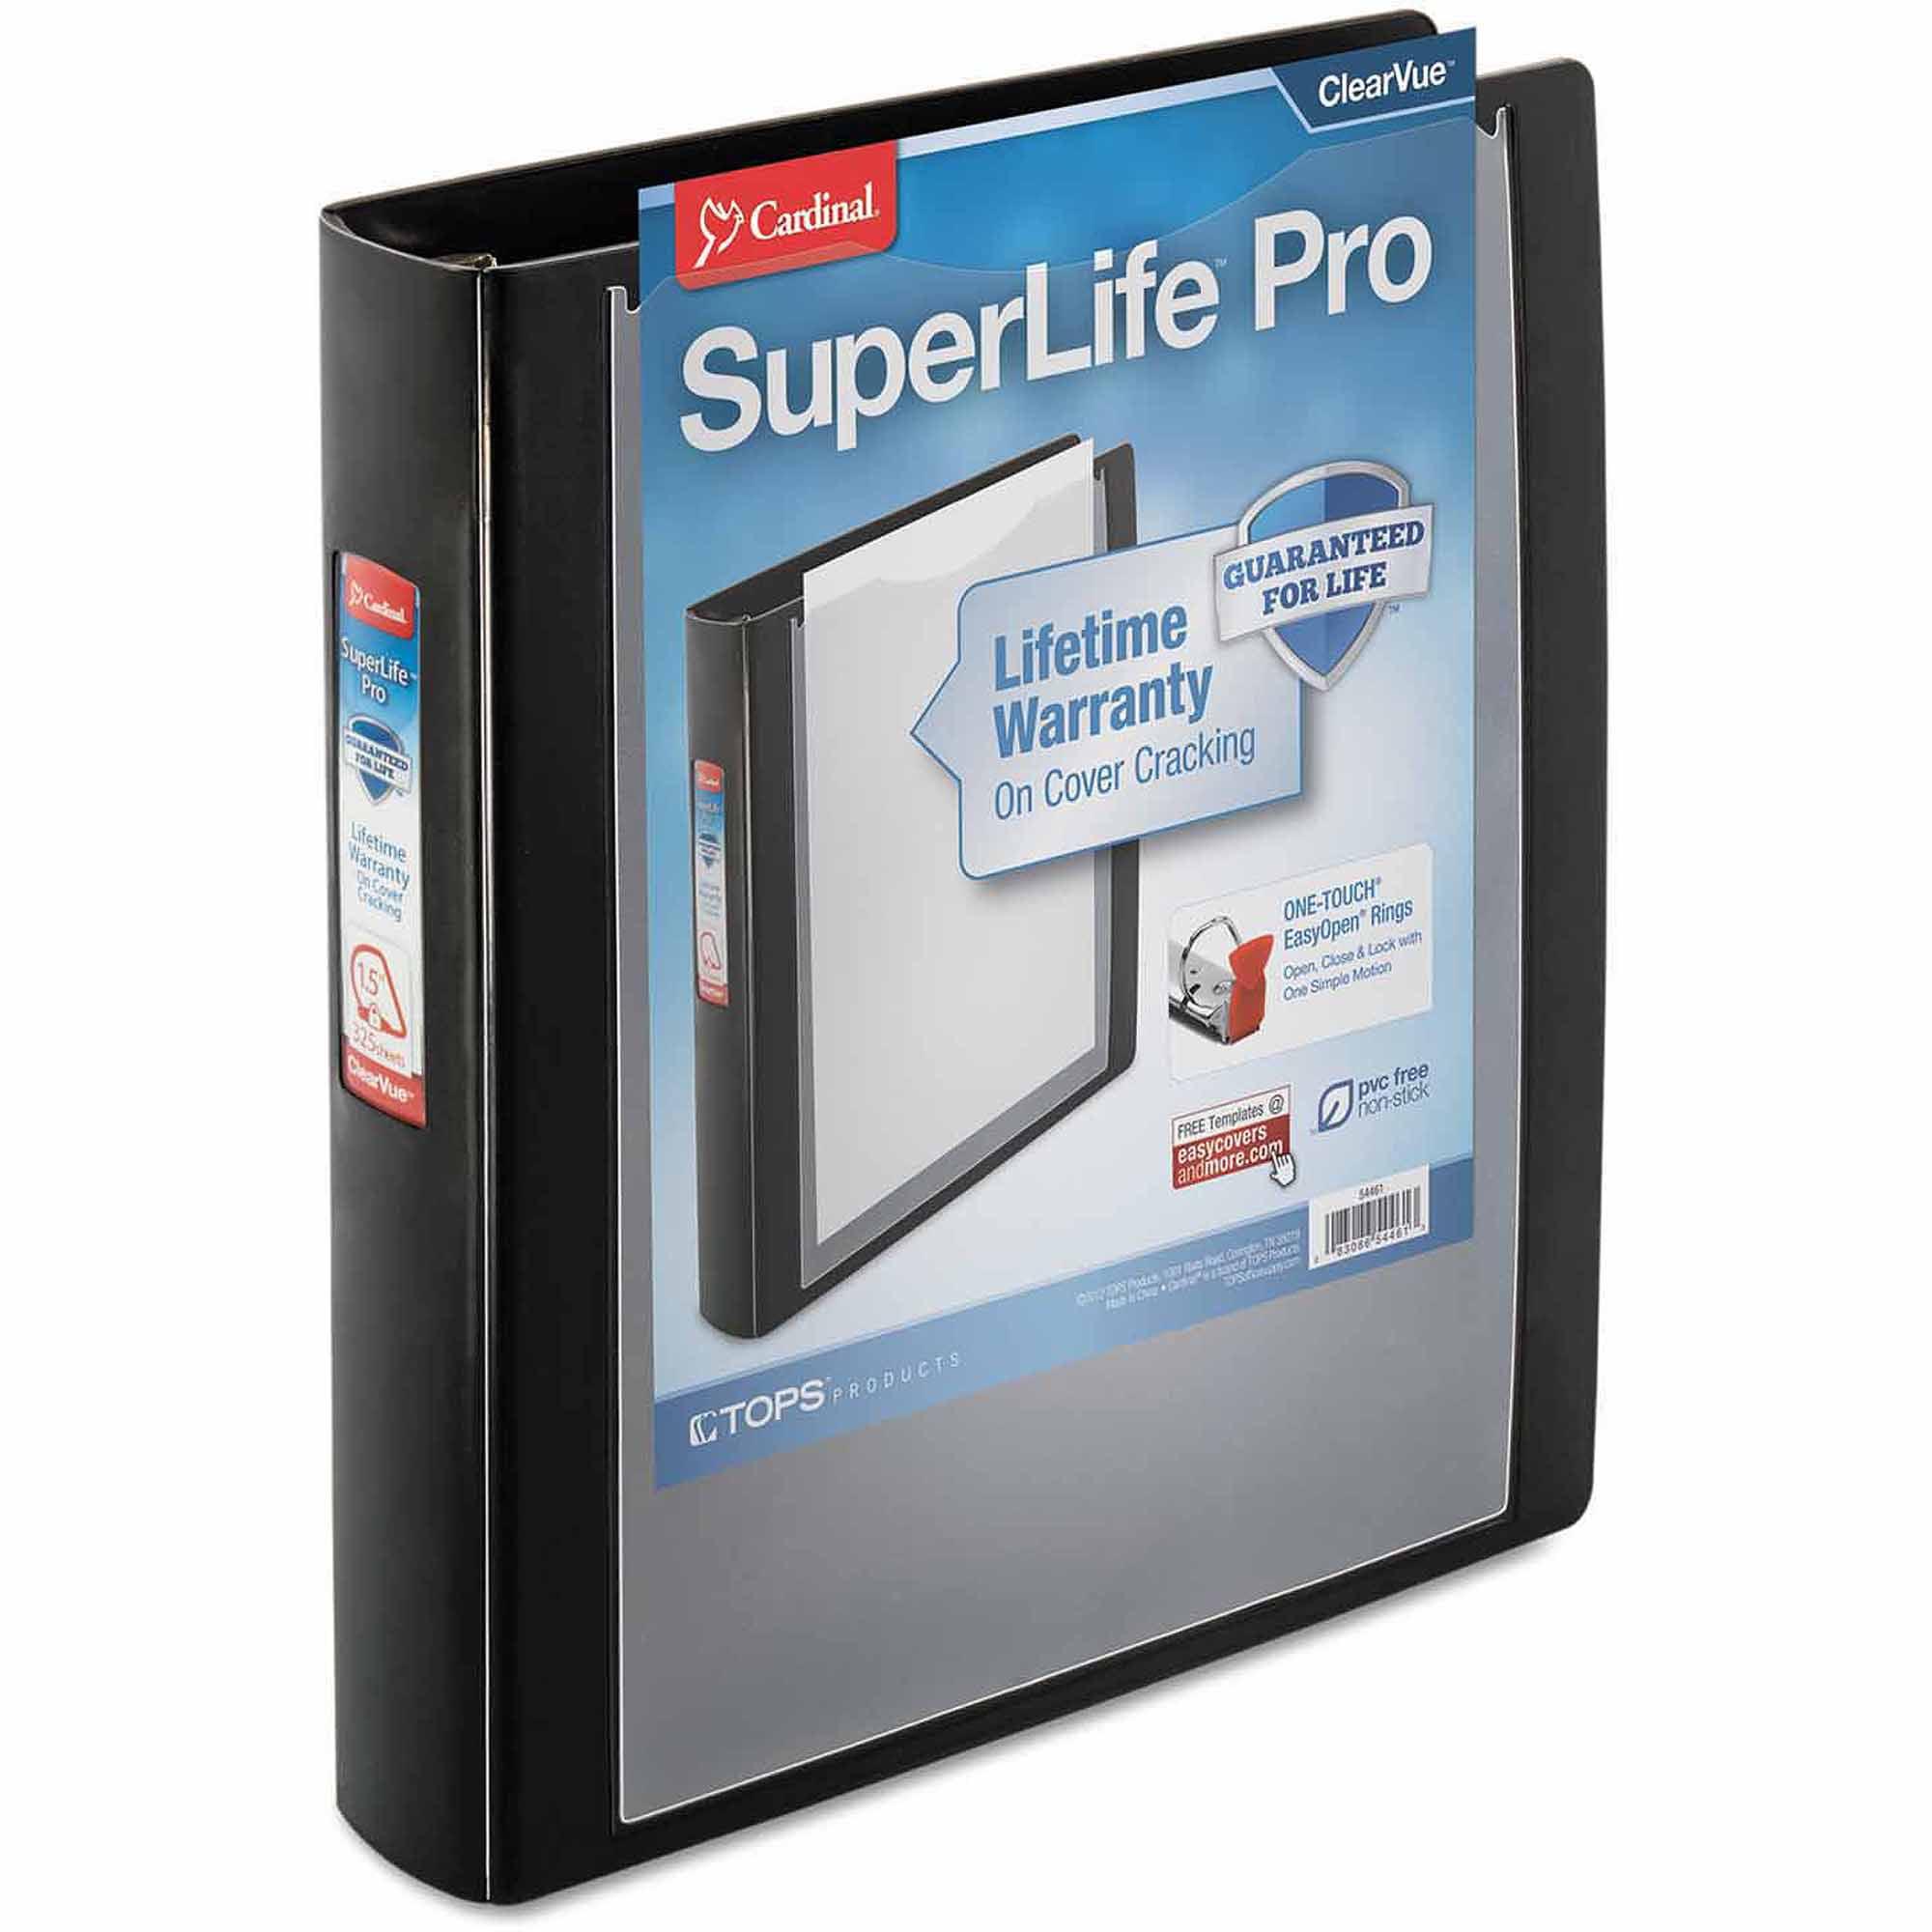 "Cardinal SuperLife Pro ClearVue EasyOpen Locking Slant-D Ring Binder, 1-1/2"" Capacity, Black"